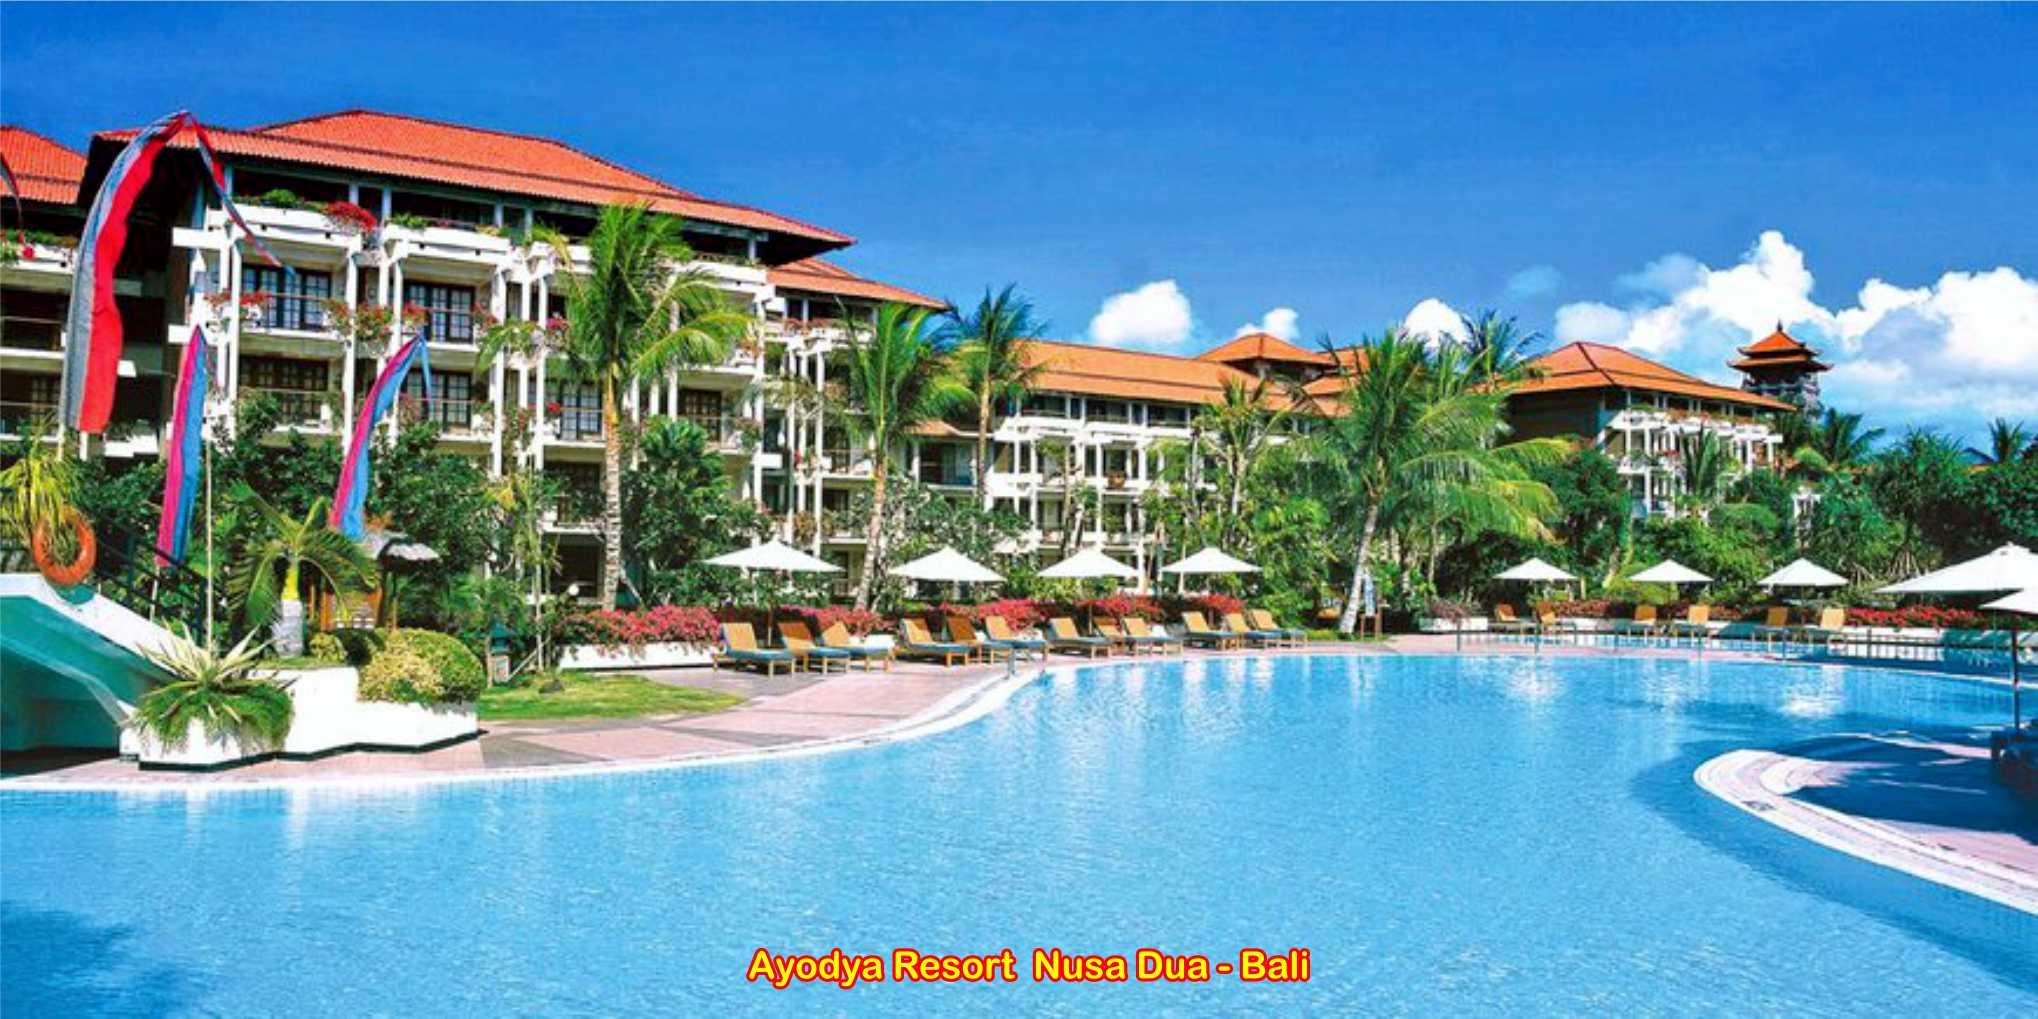 Ayodya Resort Nusa Dua, Bali - Indonesia 1